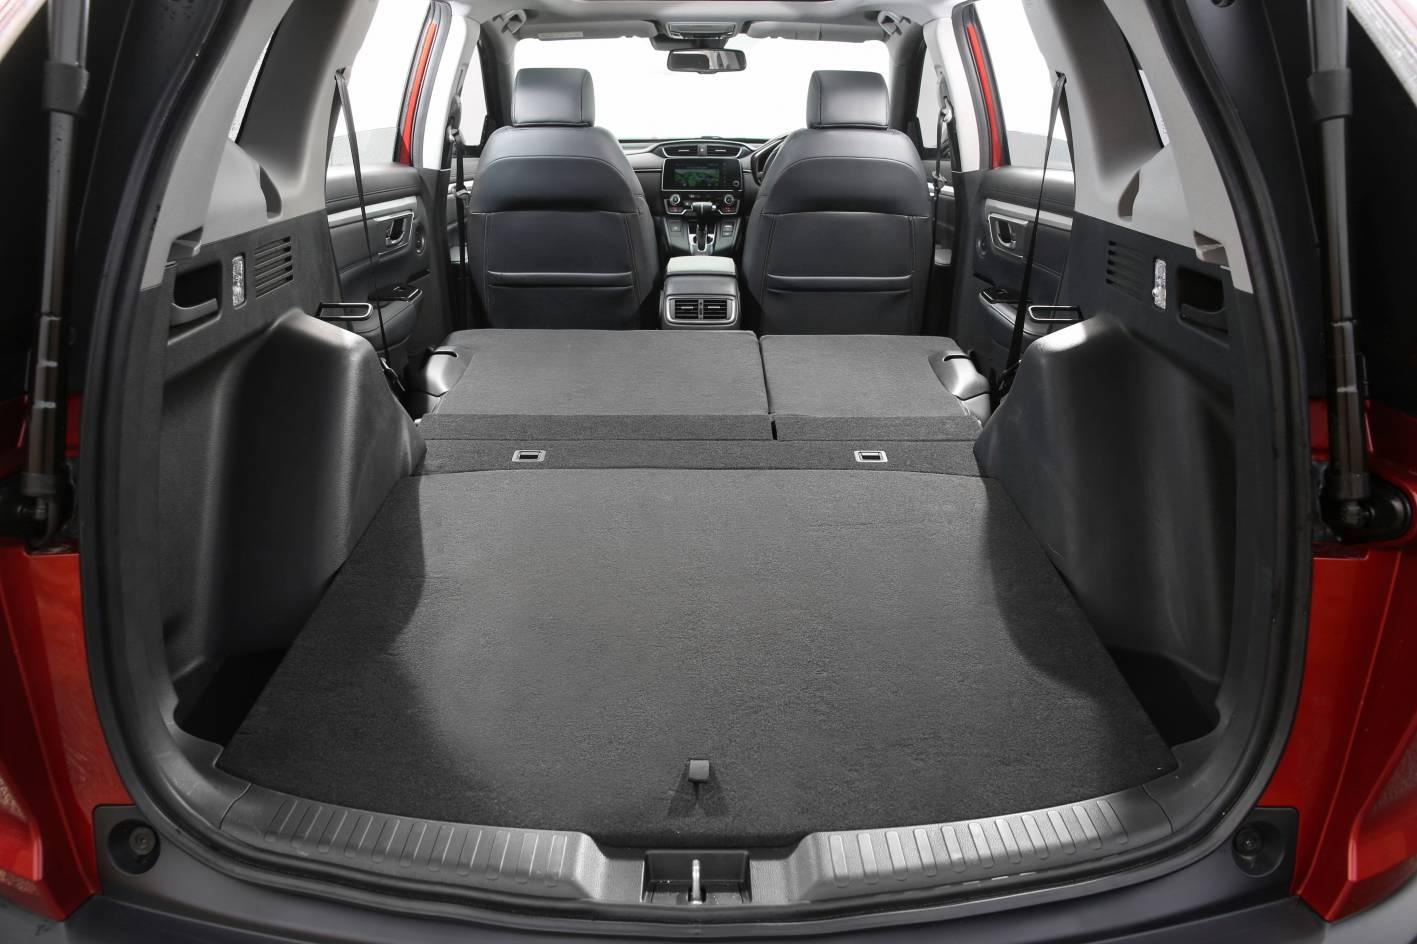 2018 Honda CR V VTi LX Cargo Space